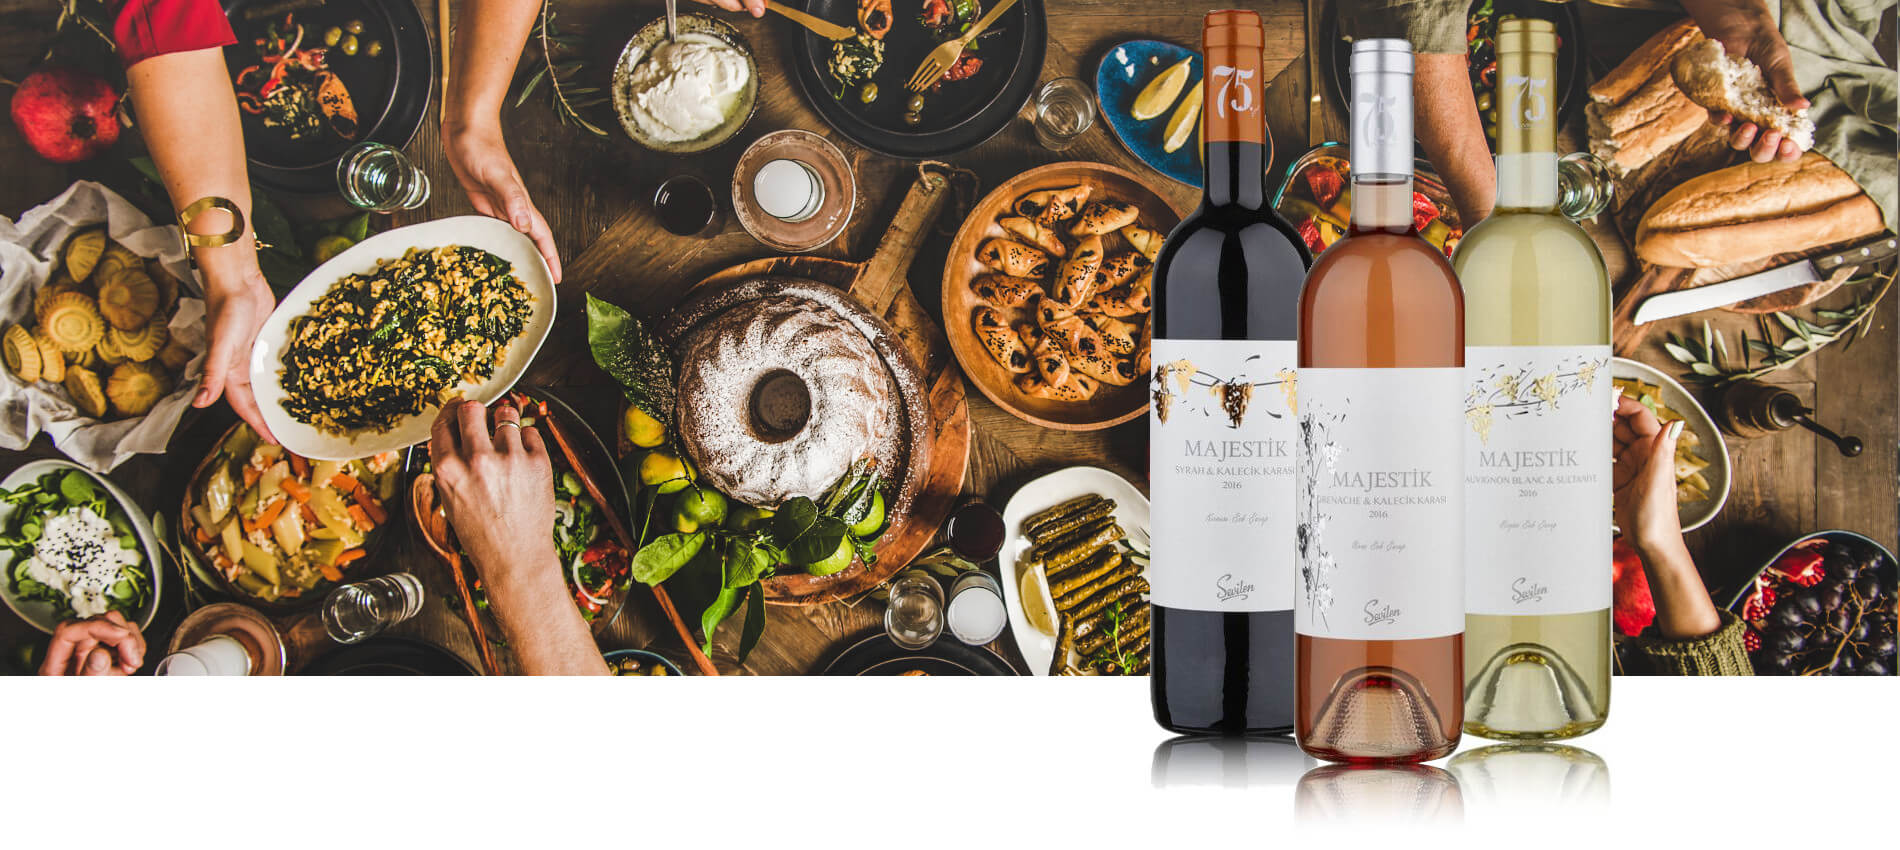 Türgi vein ja raki